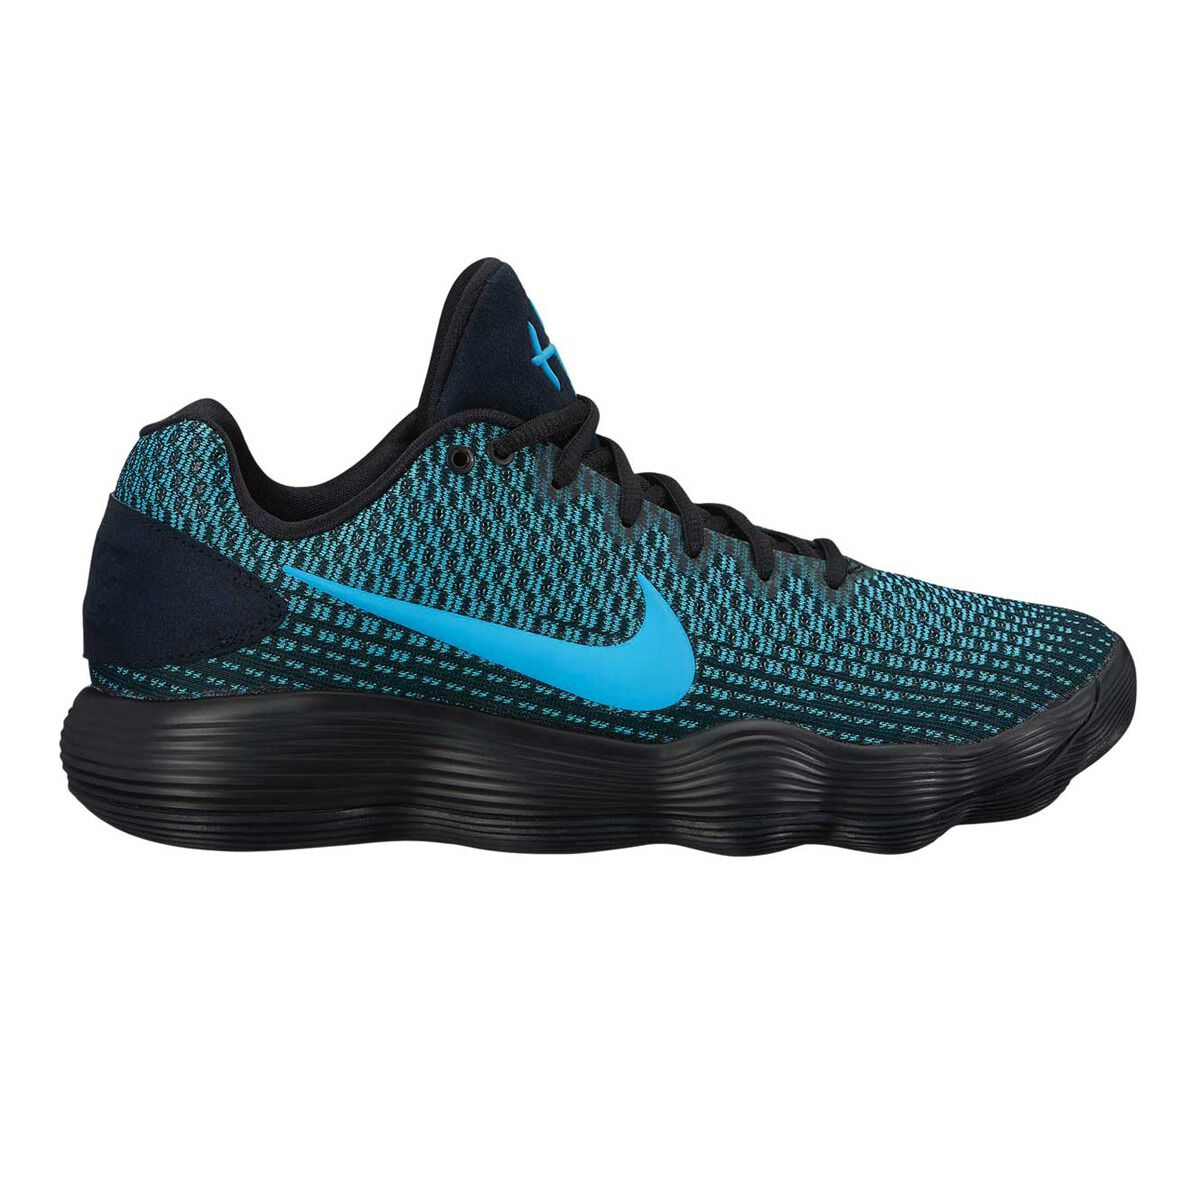 5fdd191682ad ... get nike hyperdunk 2017 low mens basketball shoes black blue us 9 black  blue 4d787 2f66a